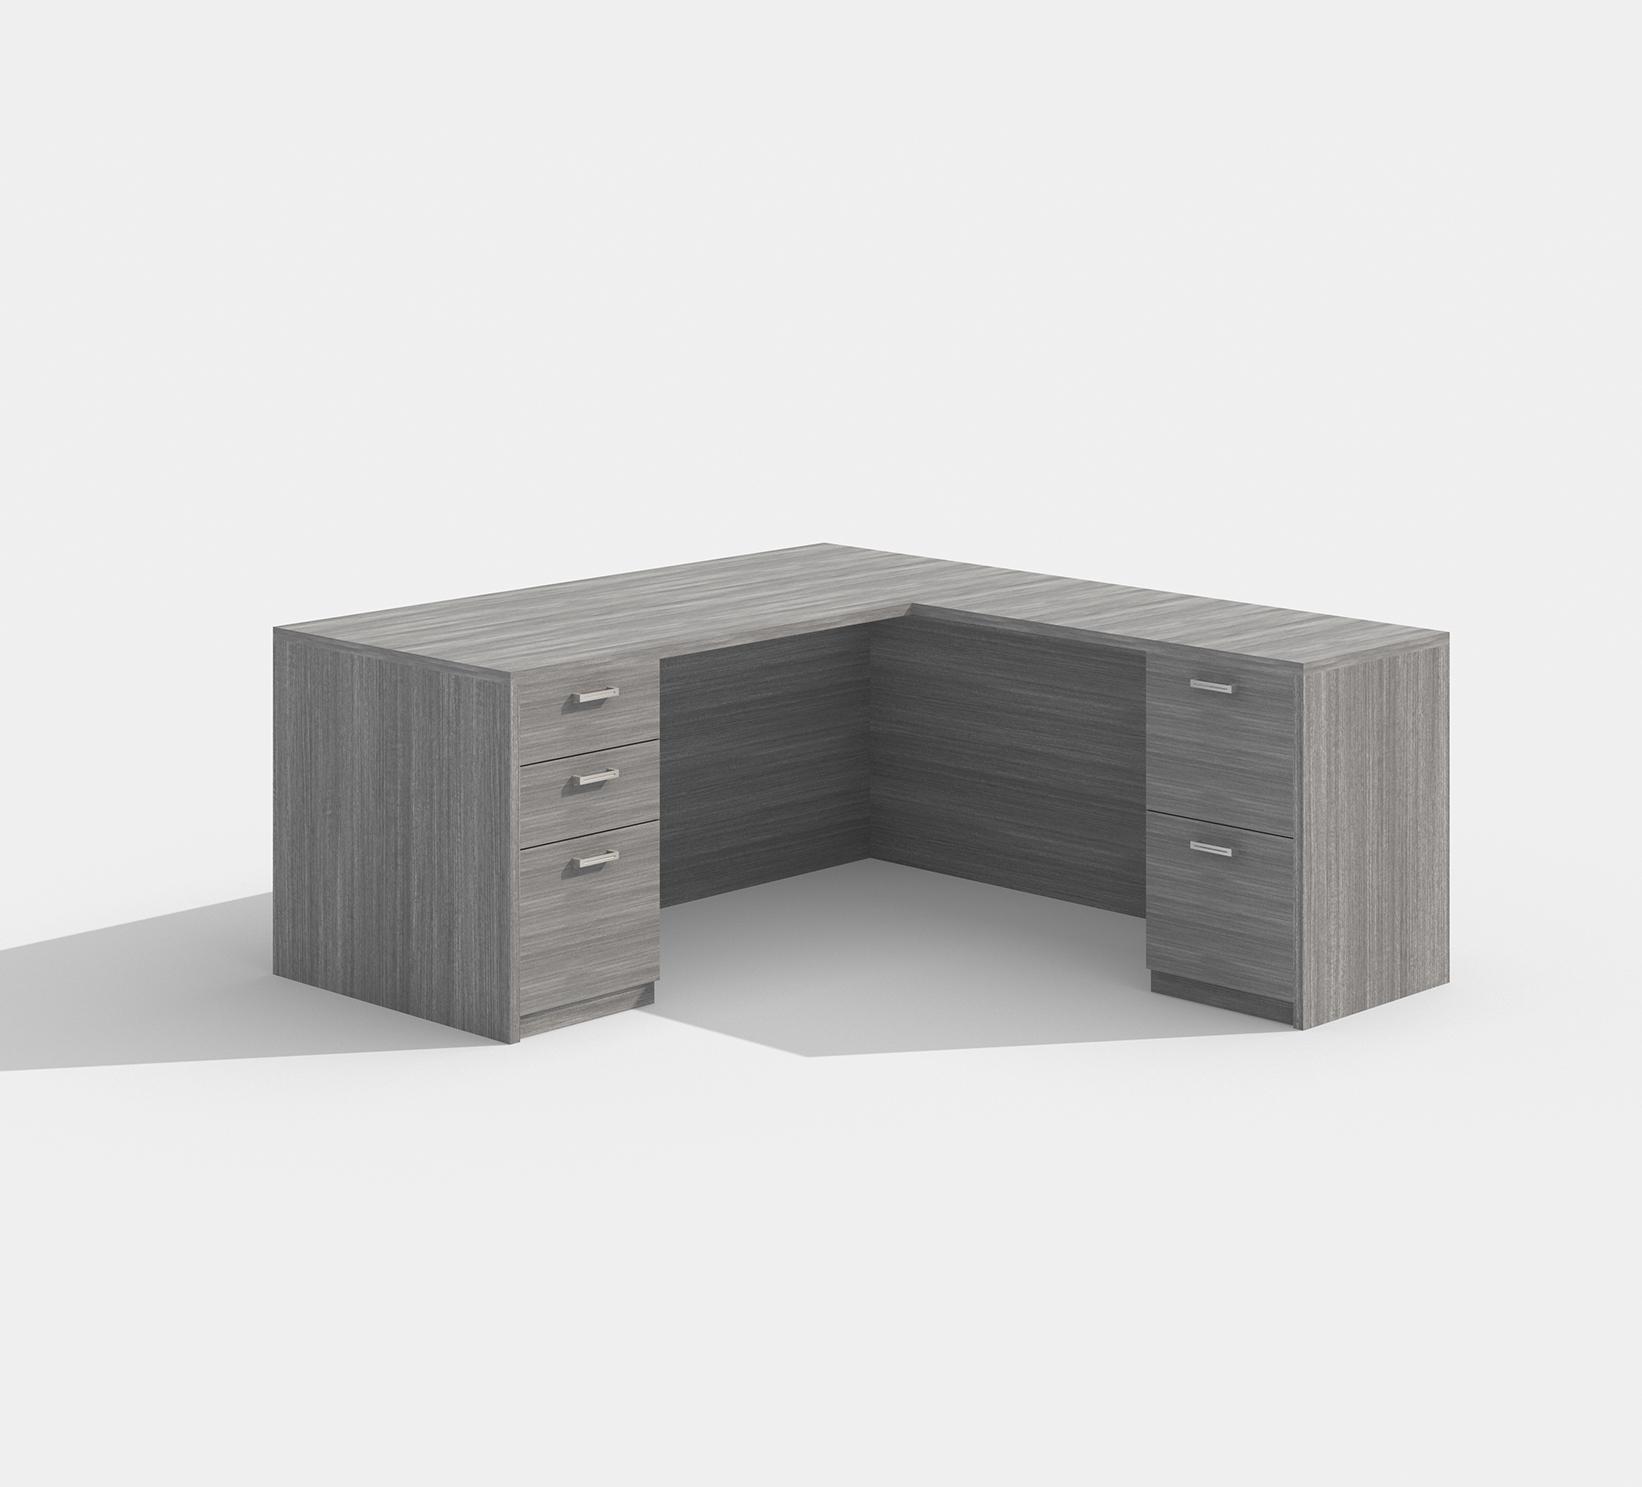 cherryman model am-418n valley gray l-desk